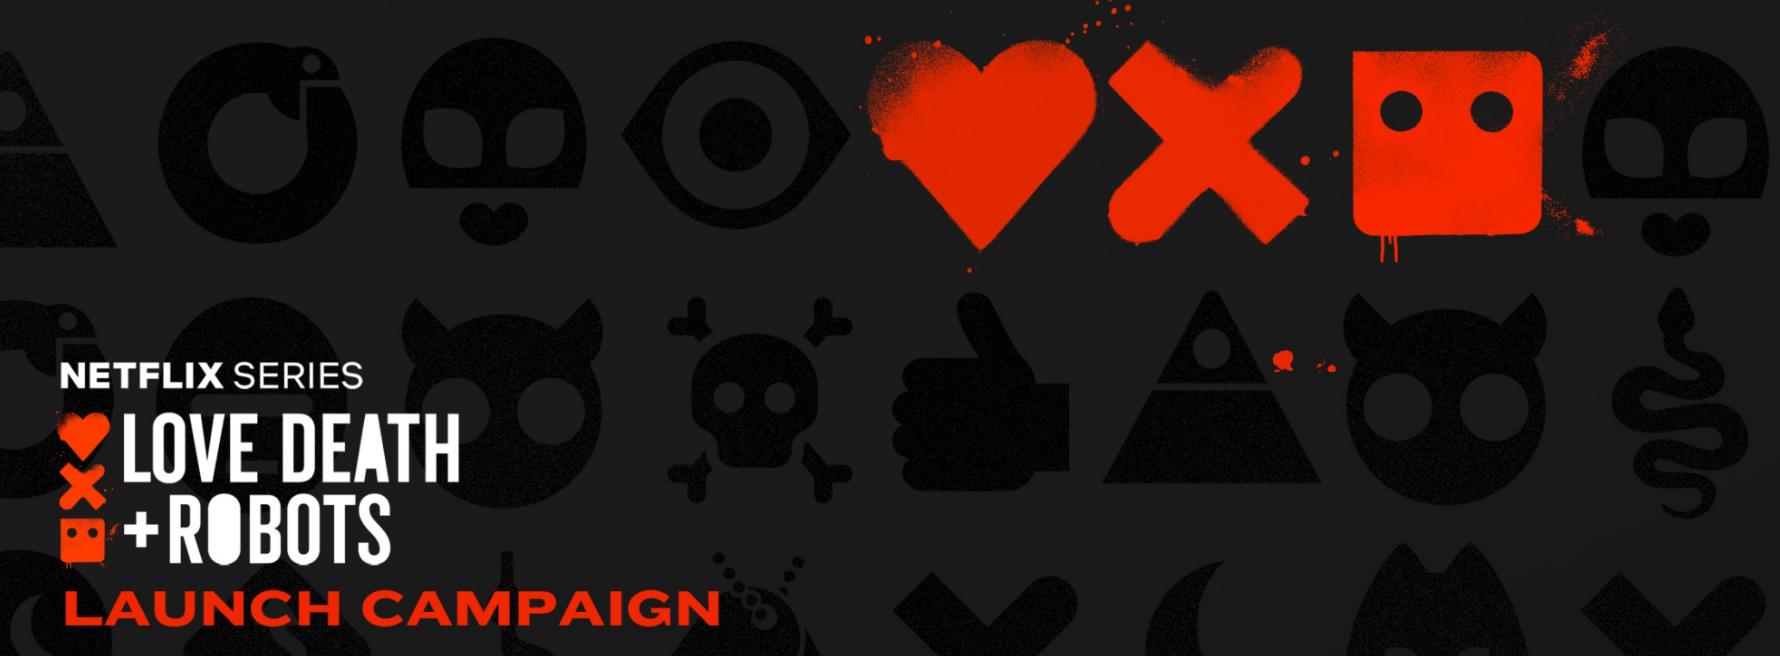 Love Death + Robots - The Shorty Awards